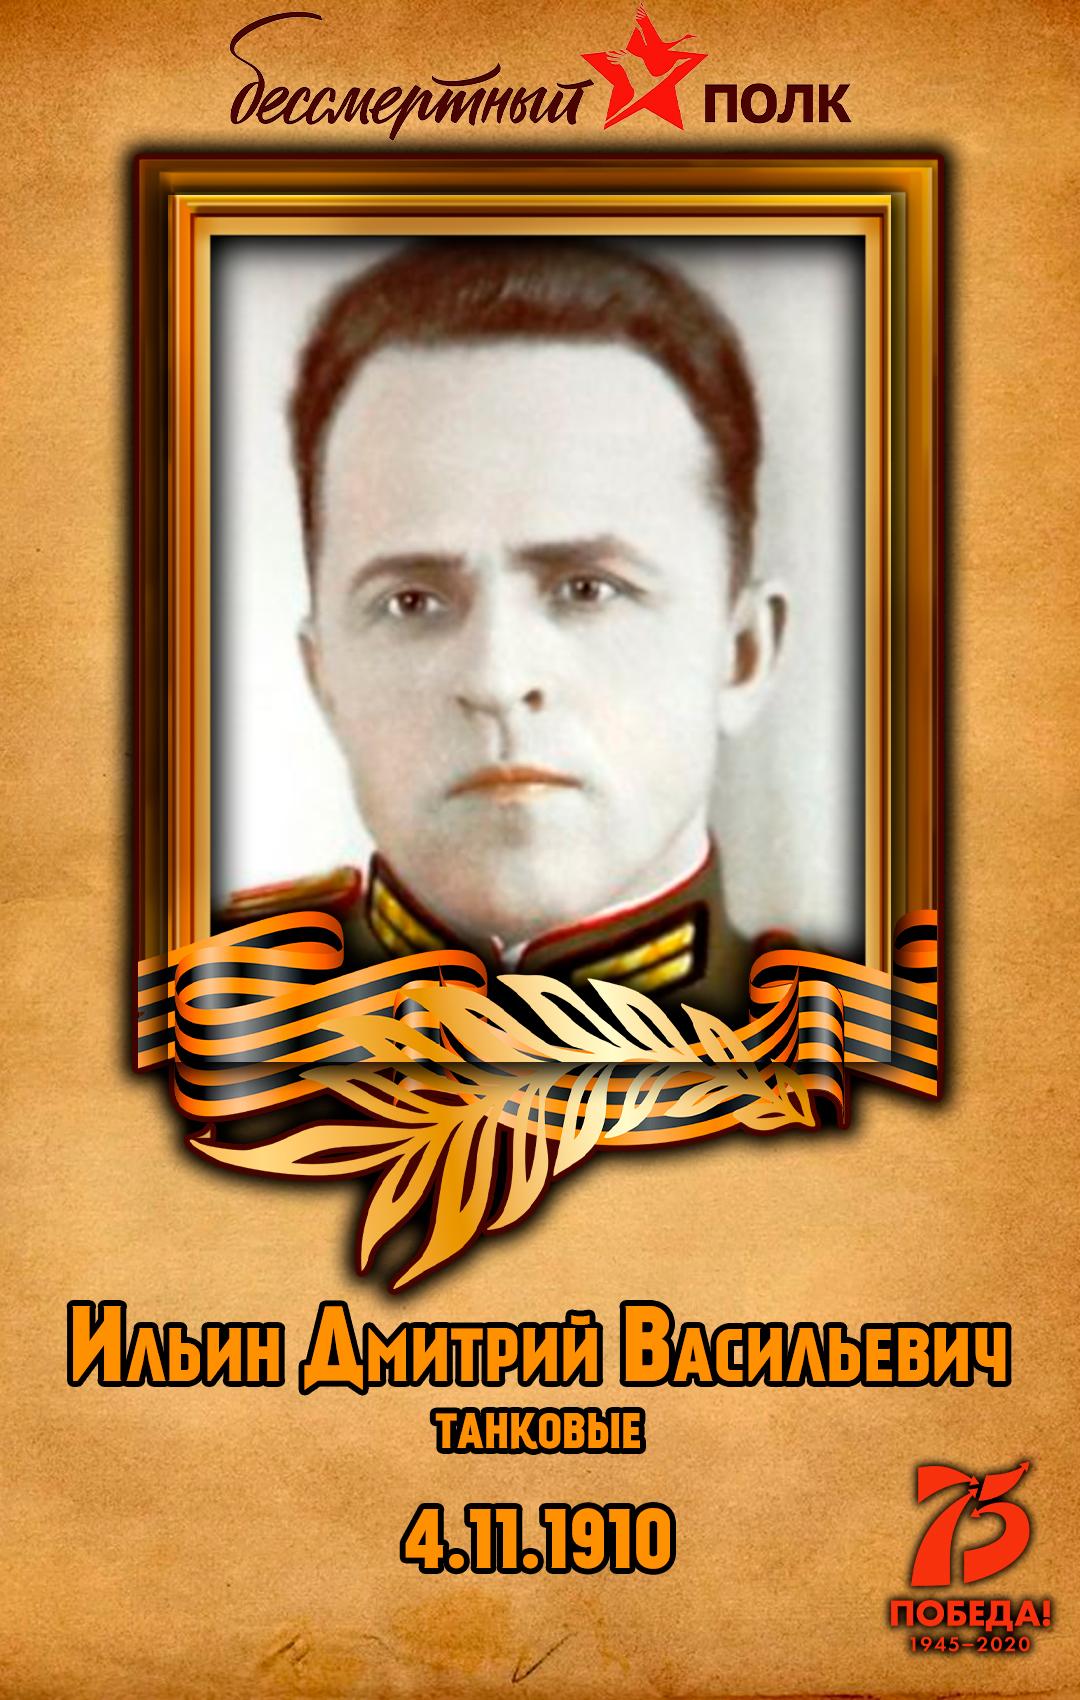 Ильин-Дмитрий-Васильевич